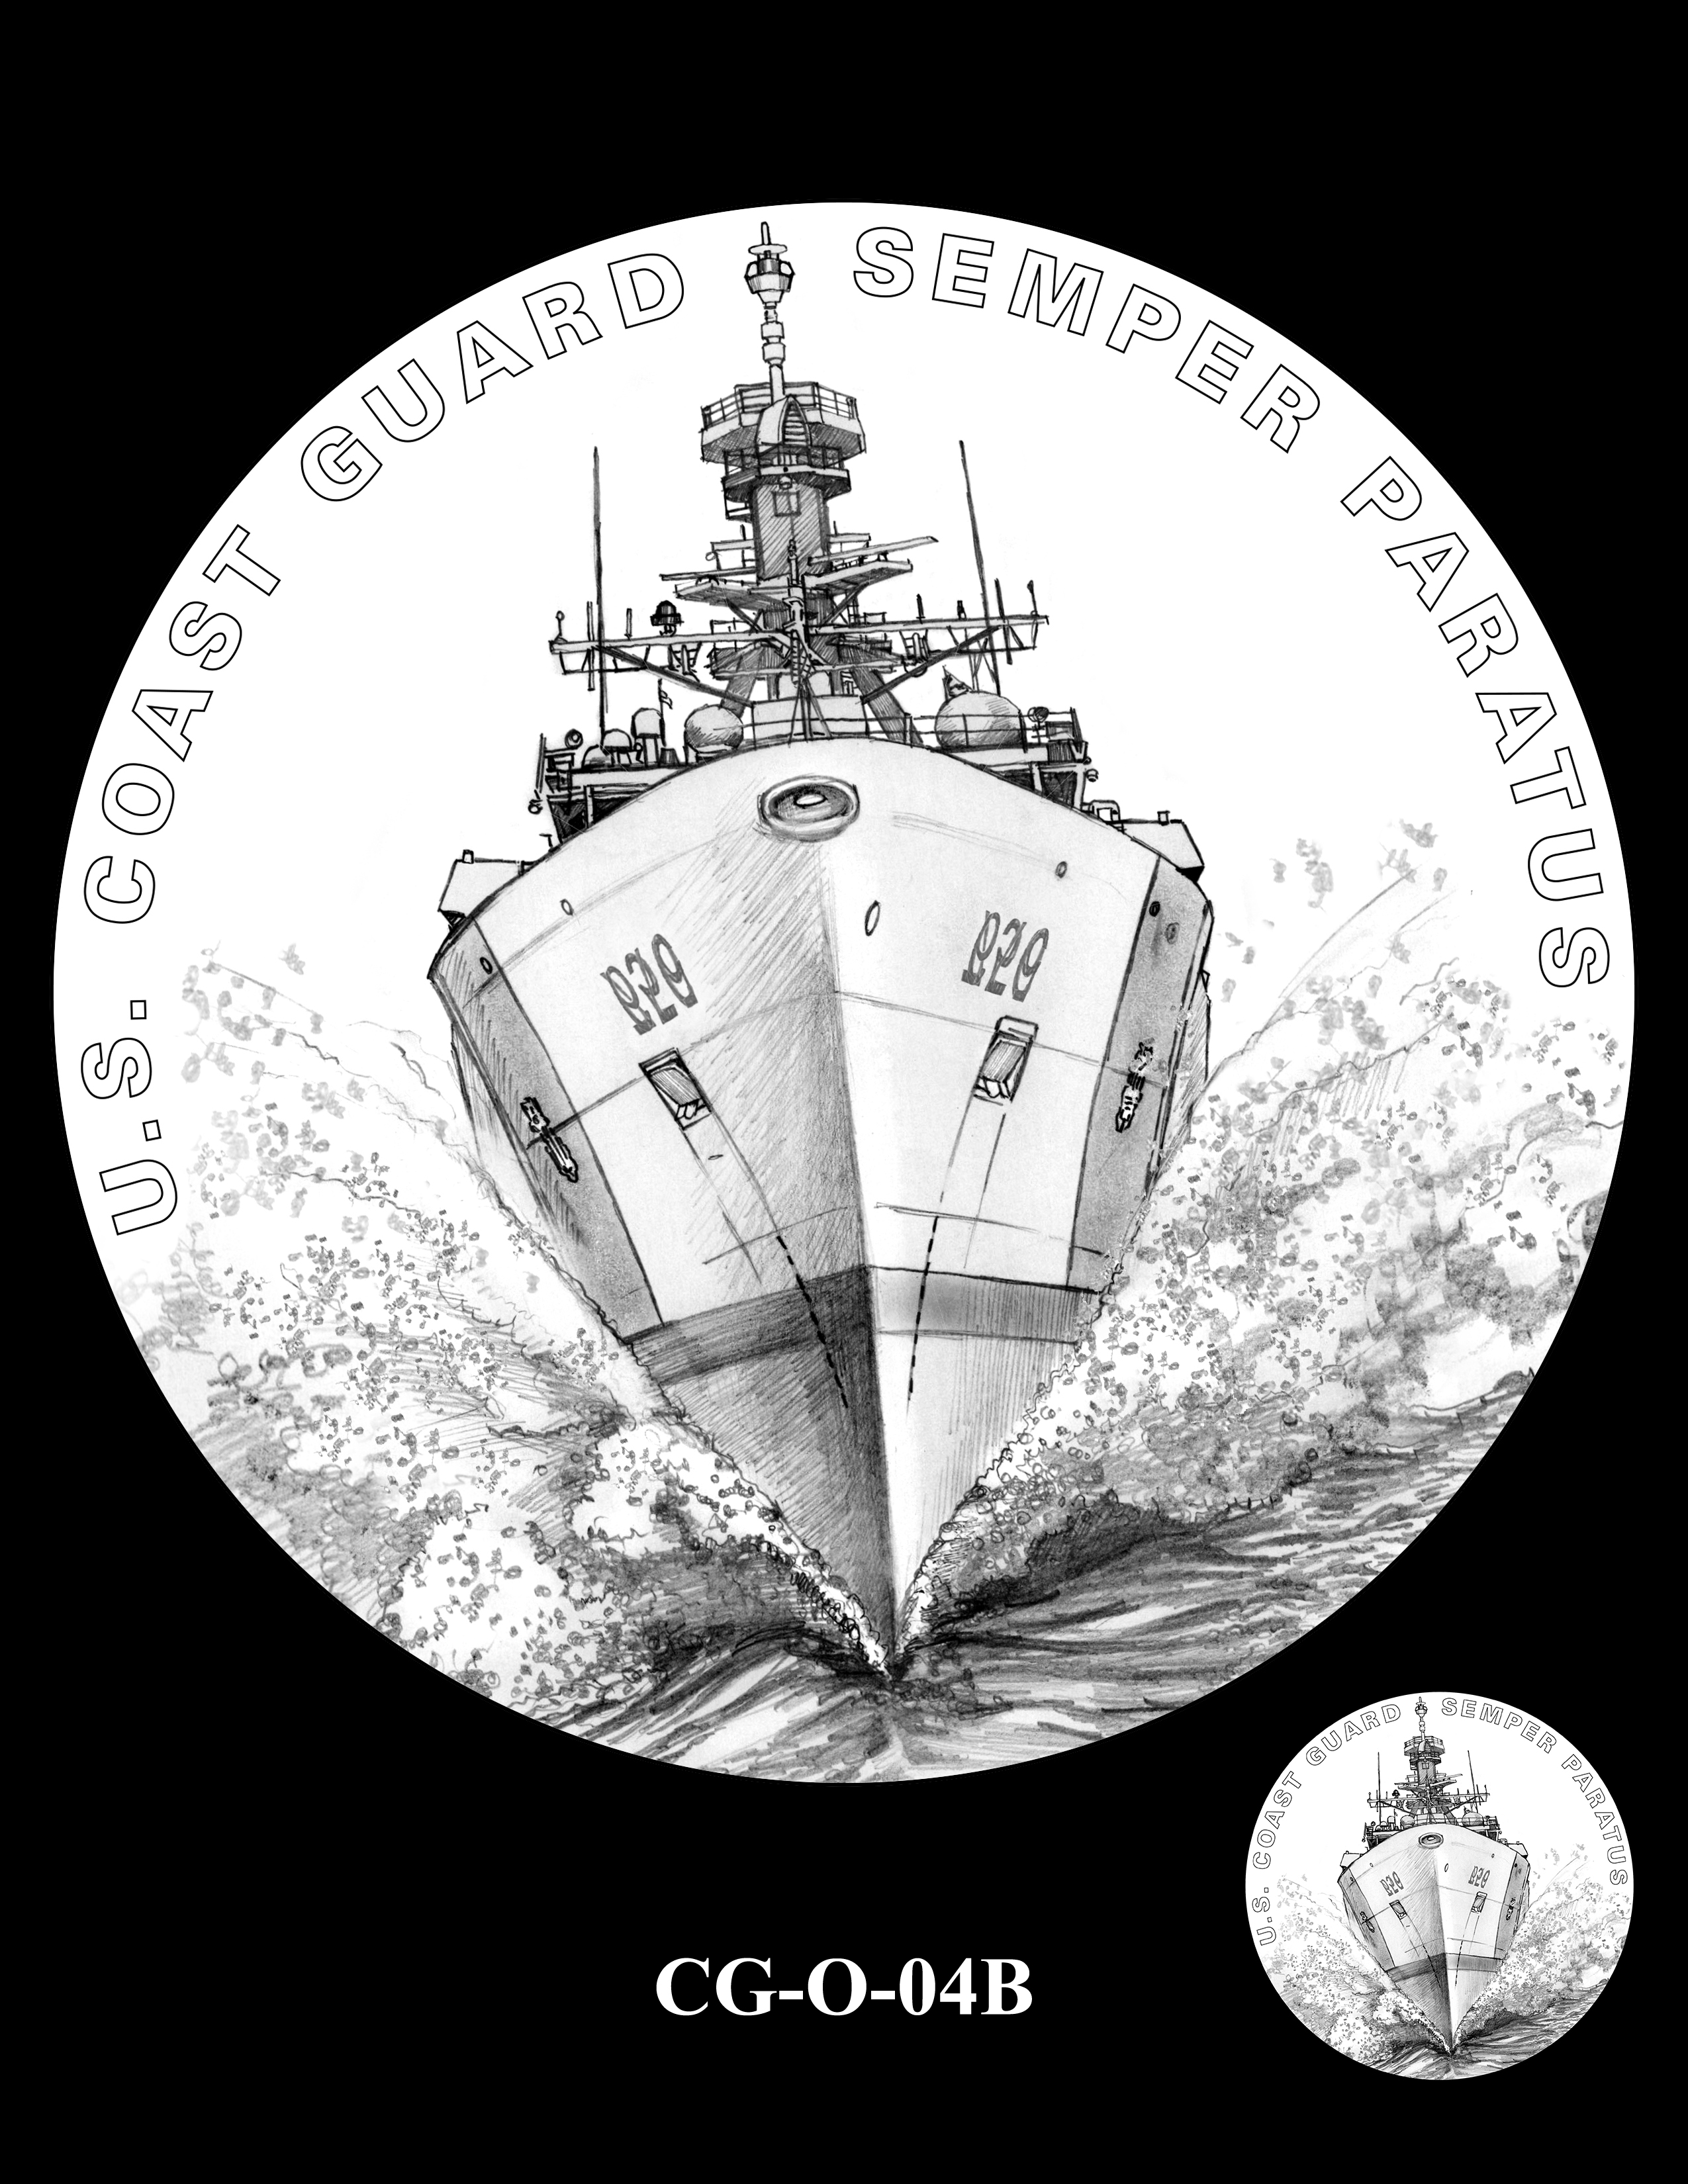 CG-O-04B -- Armed Forces Medal - Coast Guard